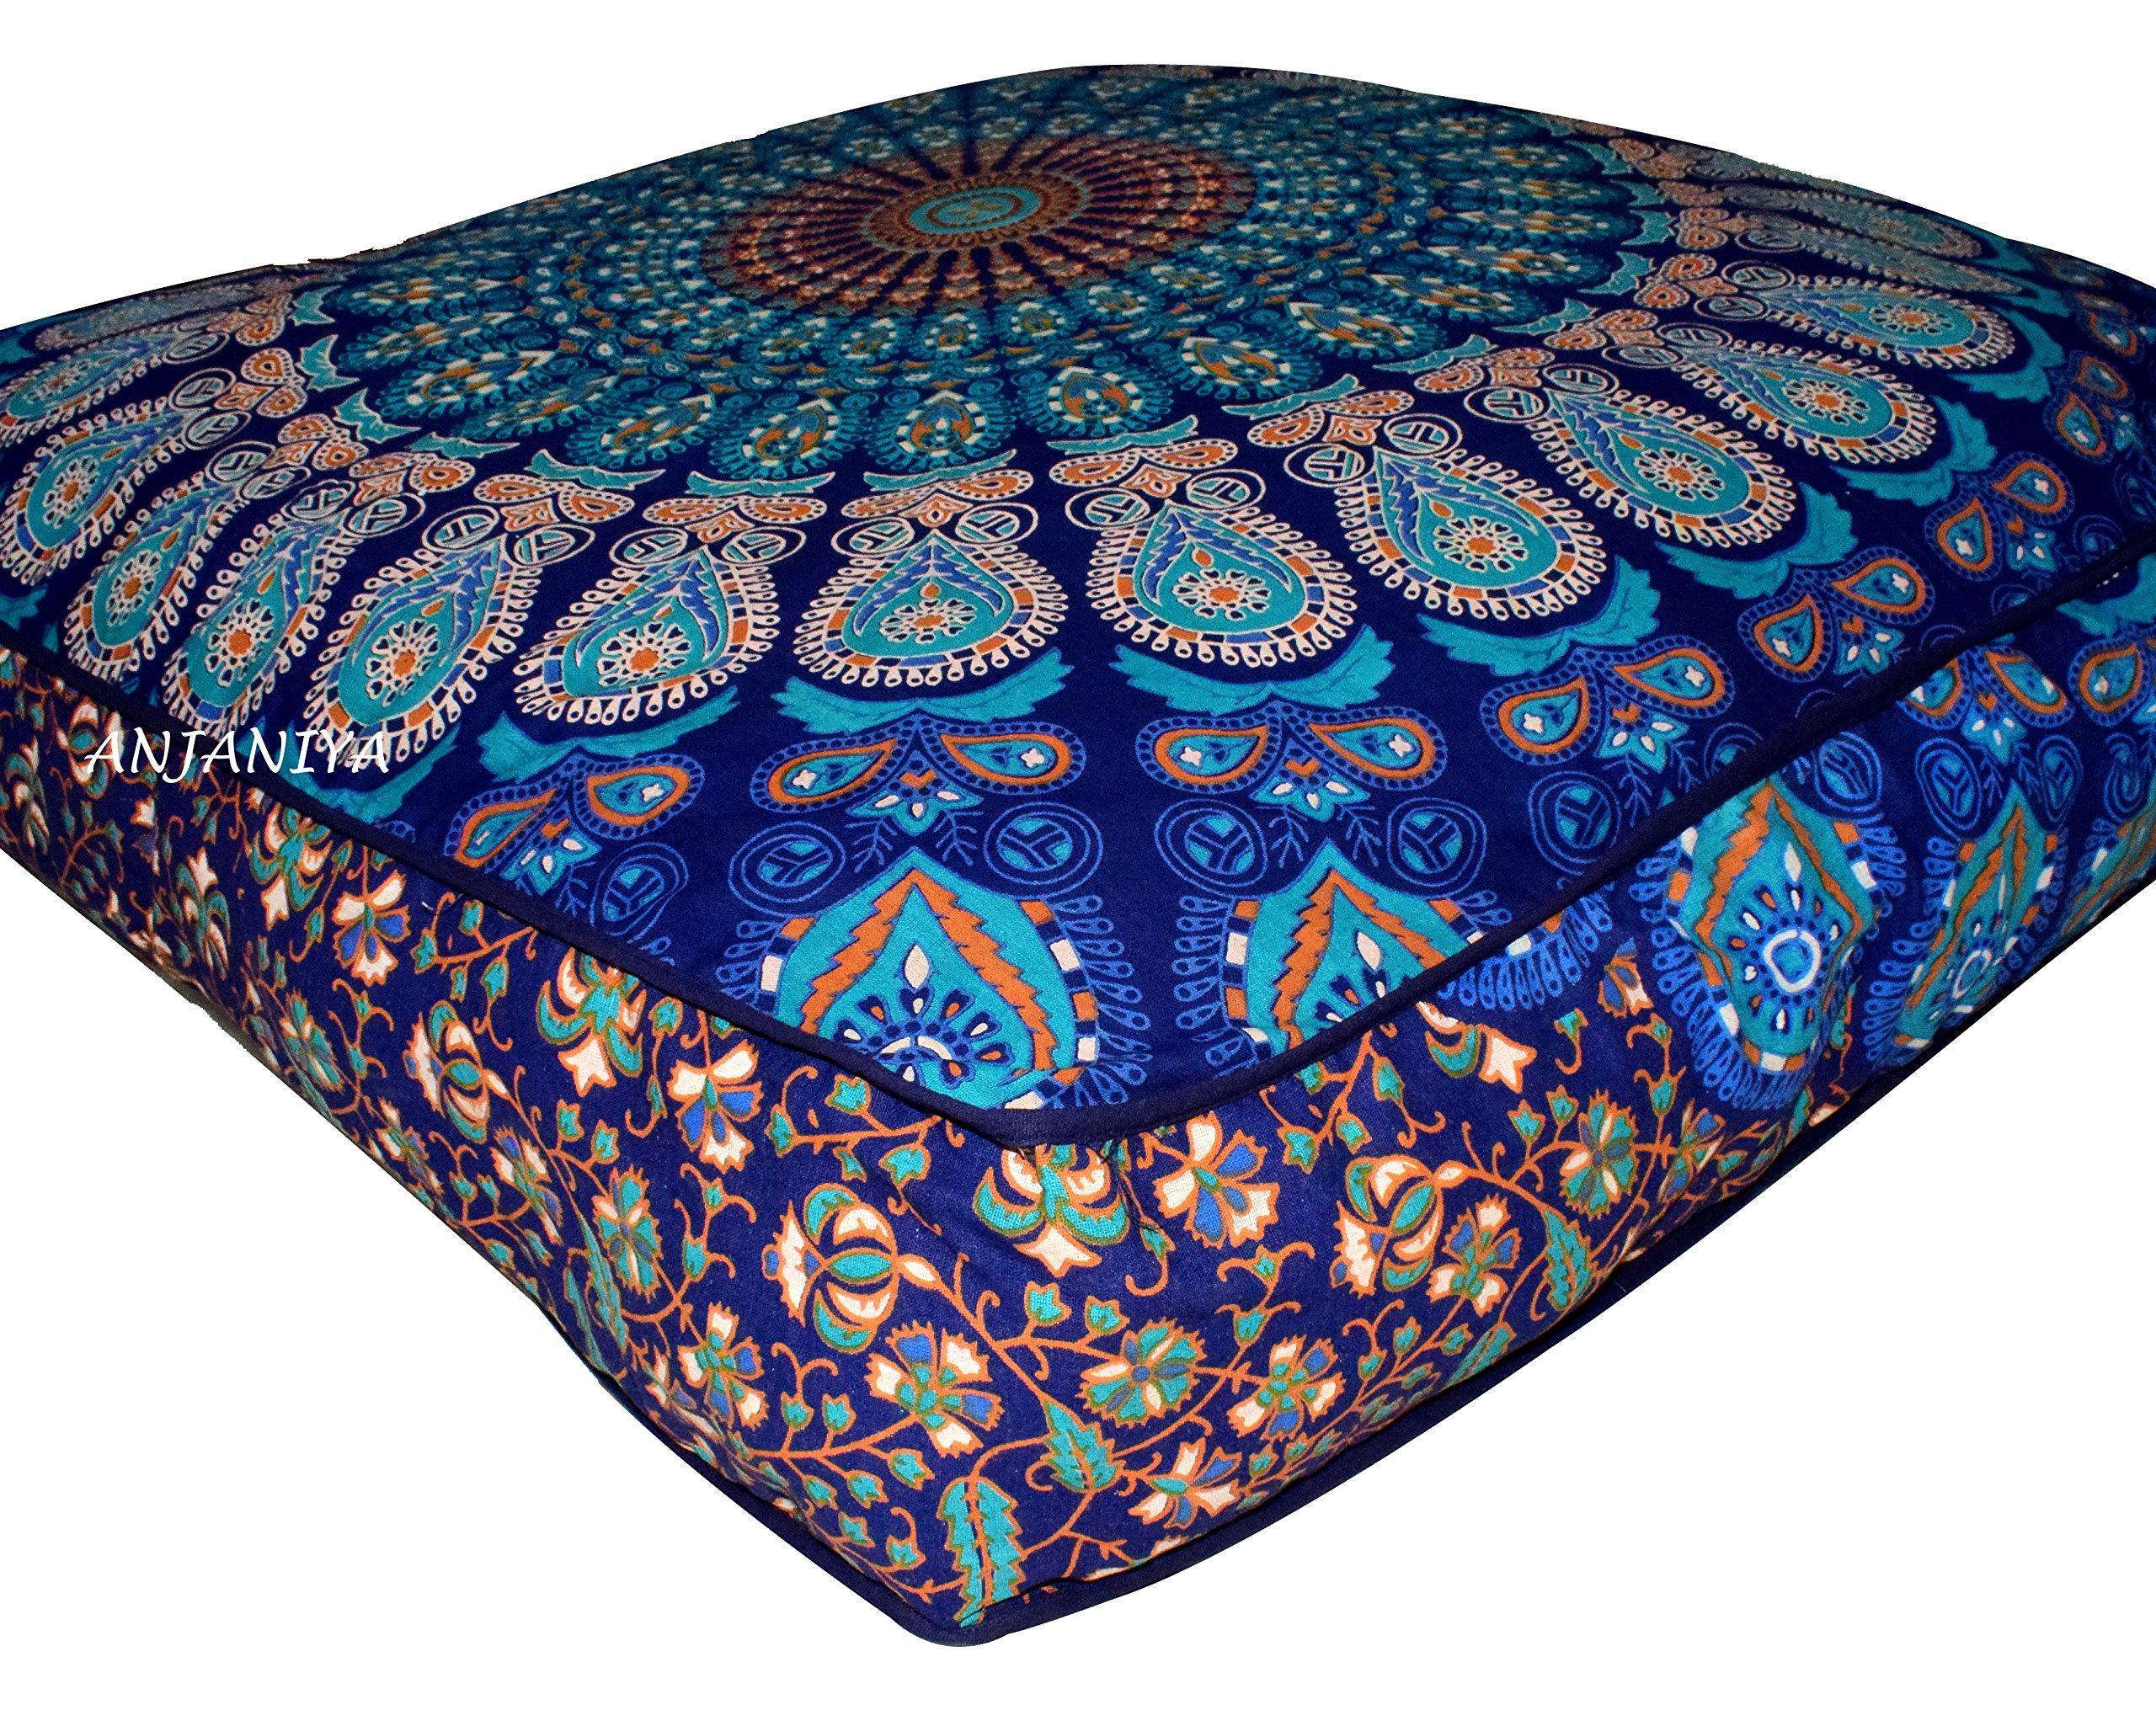 ANJANIYA - 35''x35'' Mandala Bohemian Yoga Meditation Large Square Dog Bed Outdoor Floor Pillow Cover Couch Seating Cushion Throw Hippie Decorative Boho Indian Ottoman (Blue)